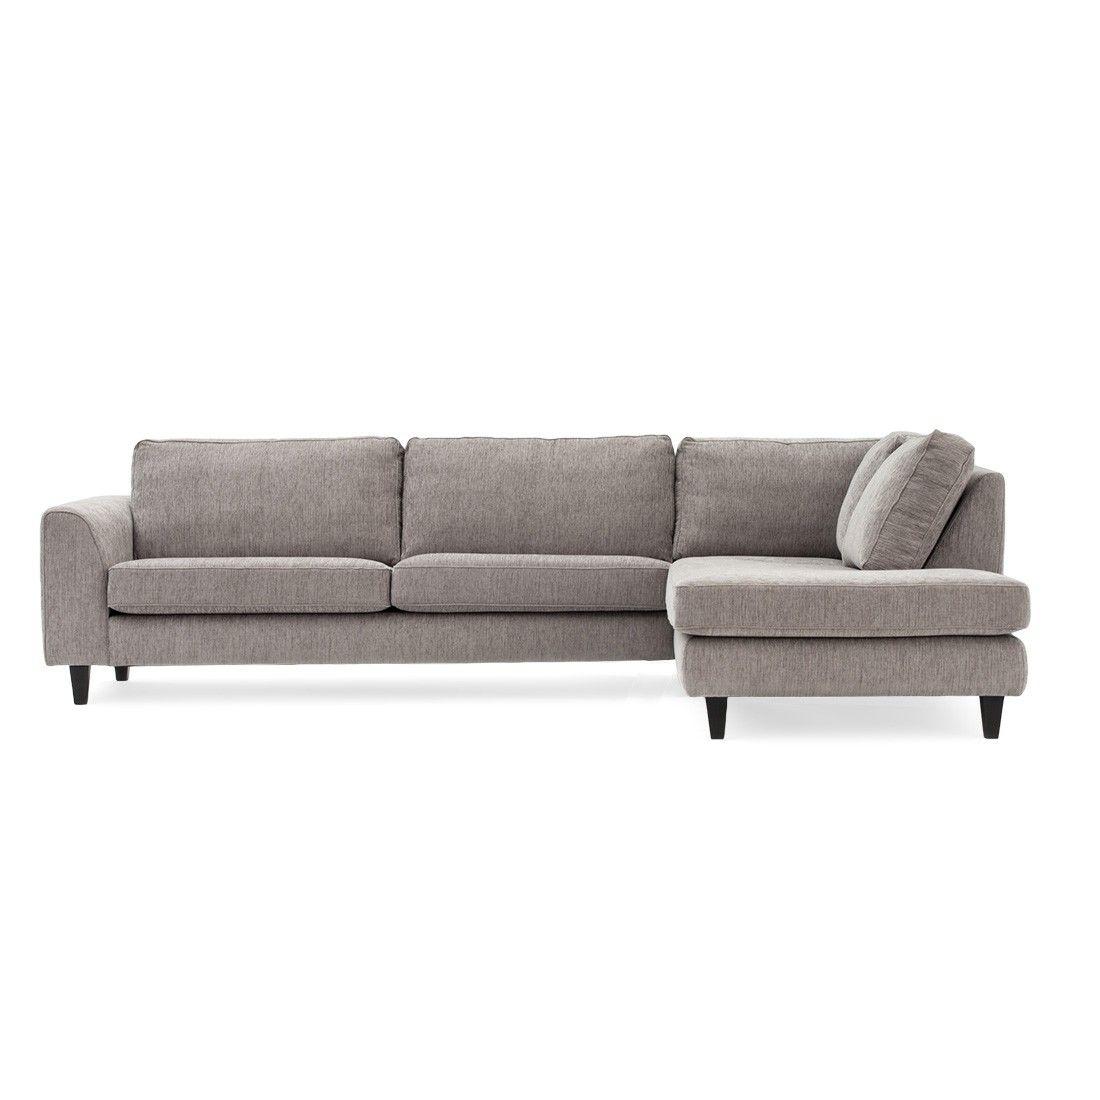 Chaise Lounge Sofa Wiki on sleep lounge sofa, modern chaise sofa, low-back sofa, bedroom sofa, fainting sofa, benches high back sofa, bed sofa, newton chaise sofa, conventional sofa, daybed sofa, double chaise sofa, curved sofa, sleeper sofa, ikea dark grey sofa, floor lounger sofa, modular lounge sofa, furniture sofa, small blue sofa, ottoman sofa, sectional sofa,